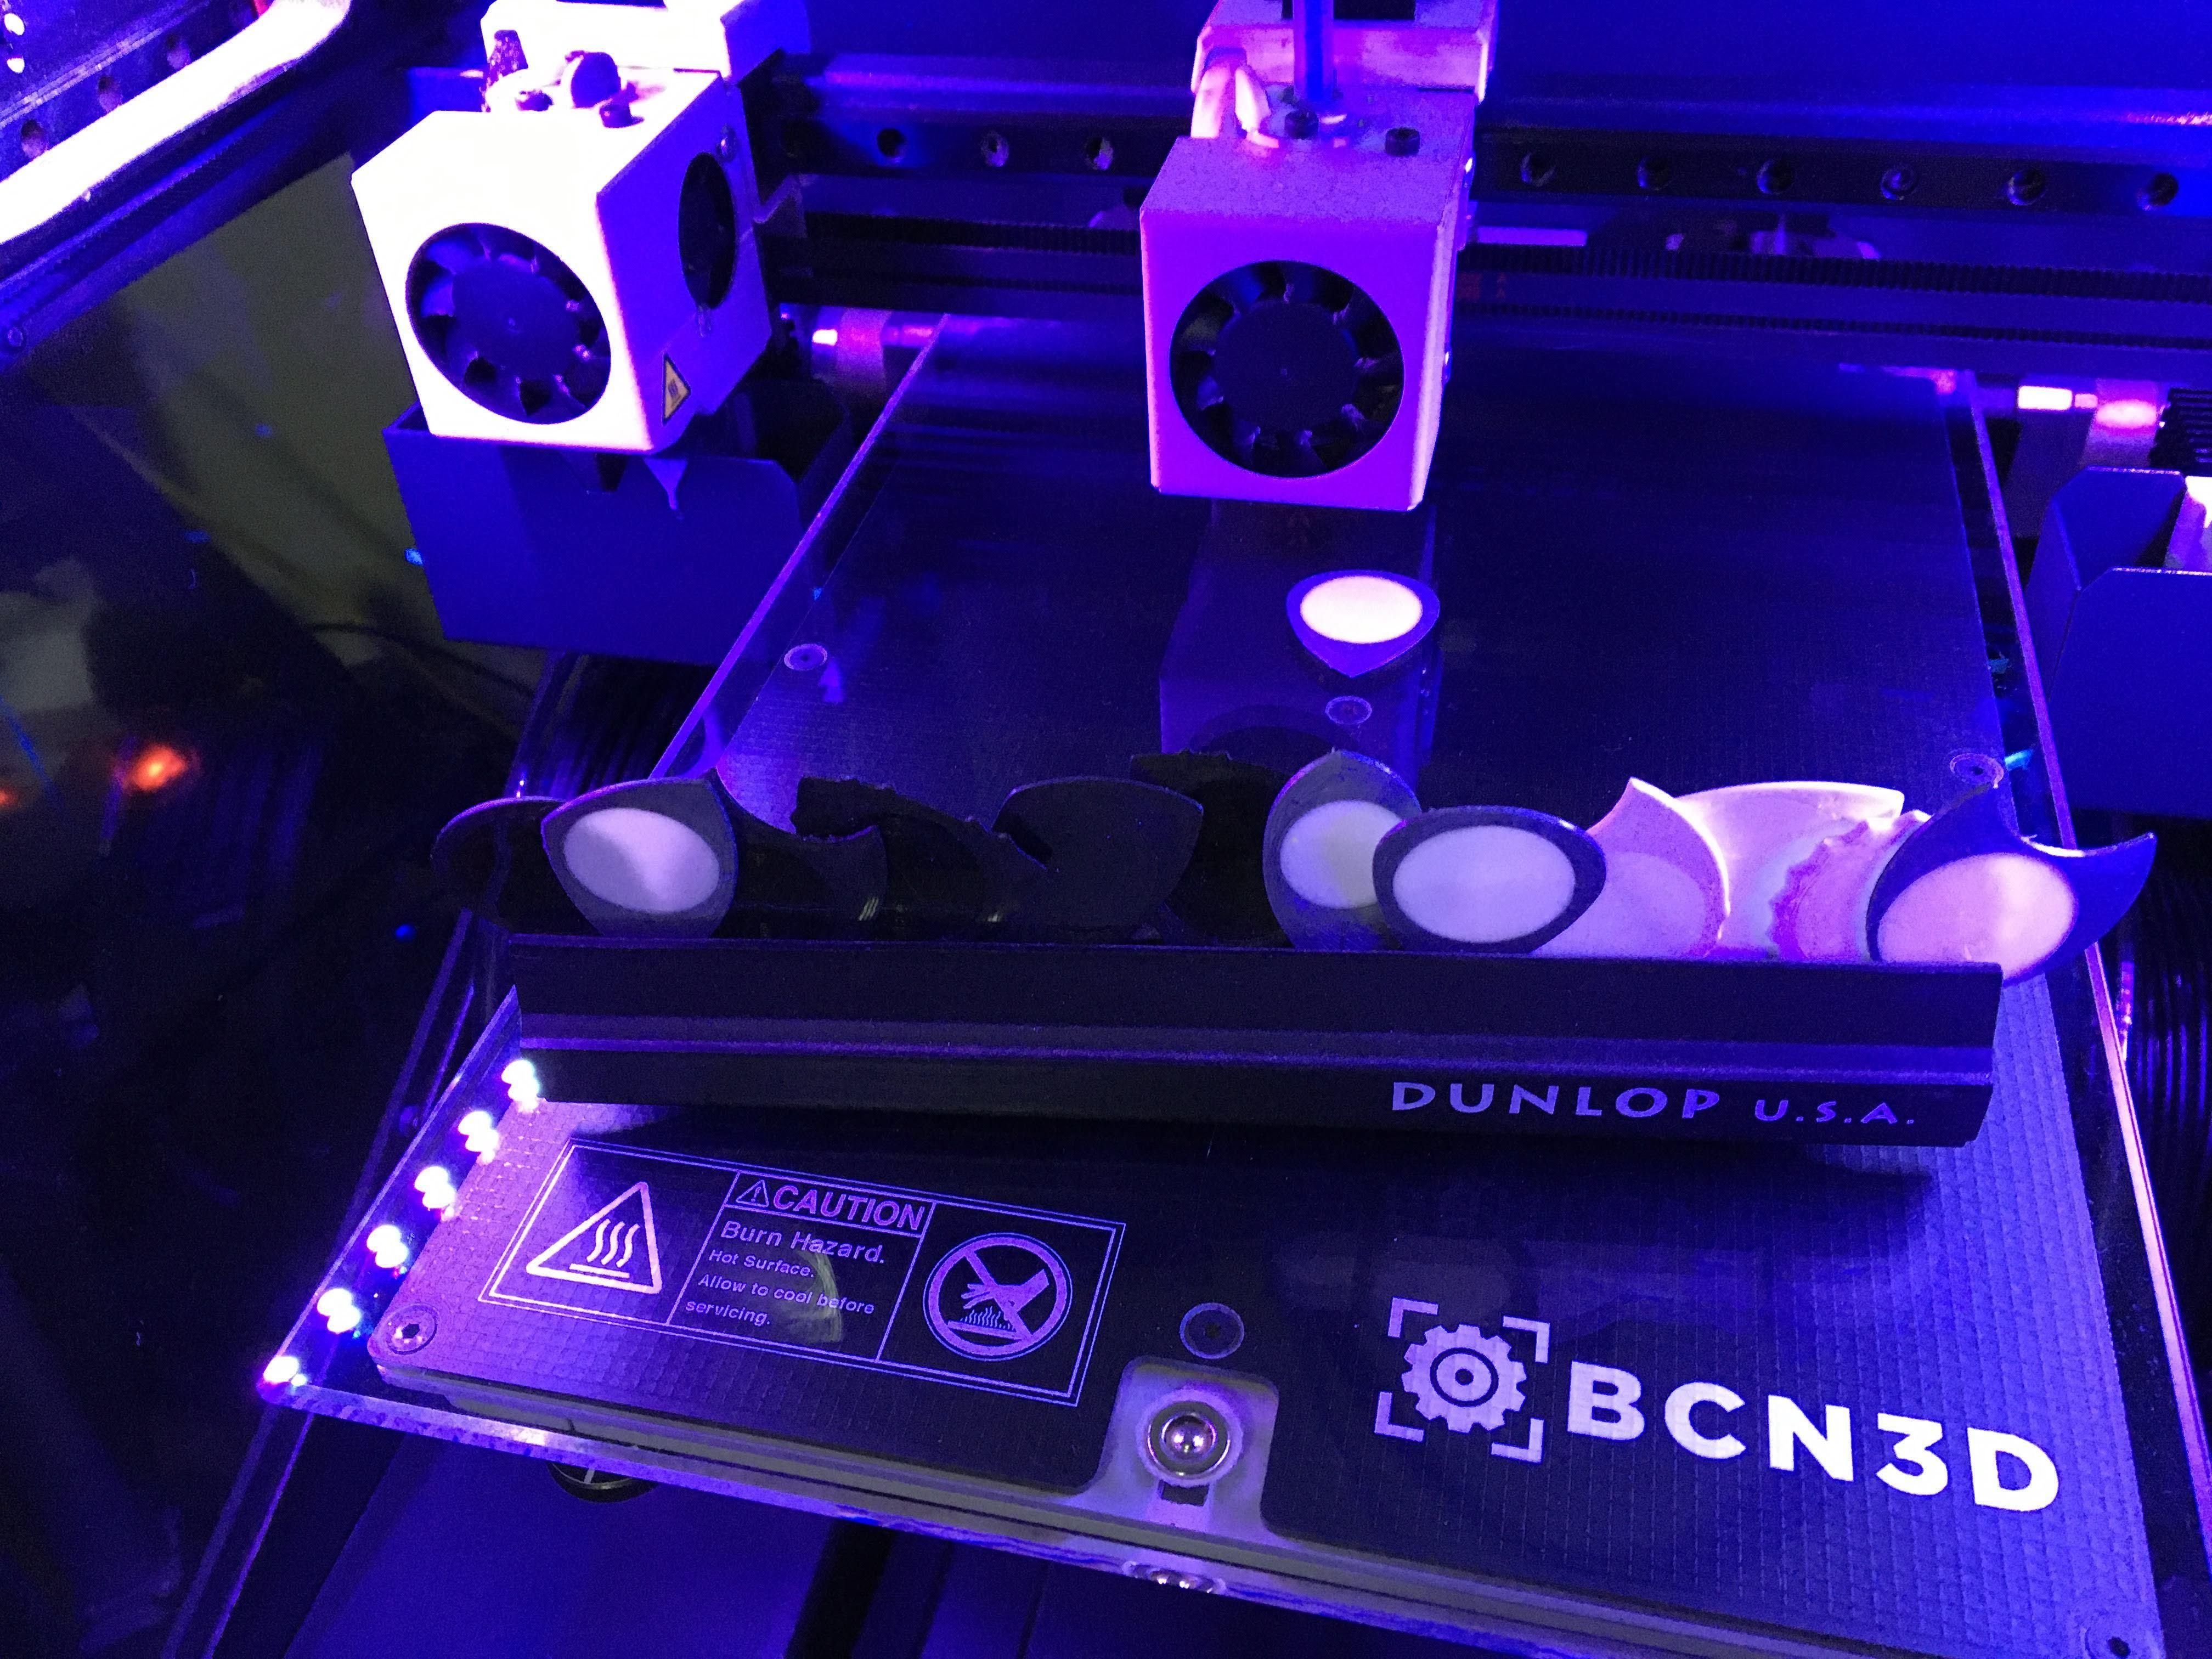 BCN3D Sigma R19 Puas Nido by eXiMienTa.JPG Download free STL file UNU-DENT 3D Guitar Tine 2 Materials PLA / TPU Serrated Tines • Design to 3D print, carleslluisar